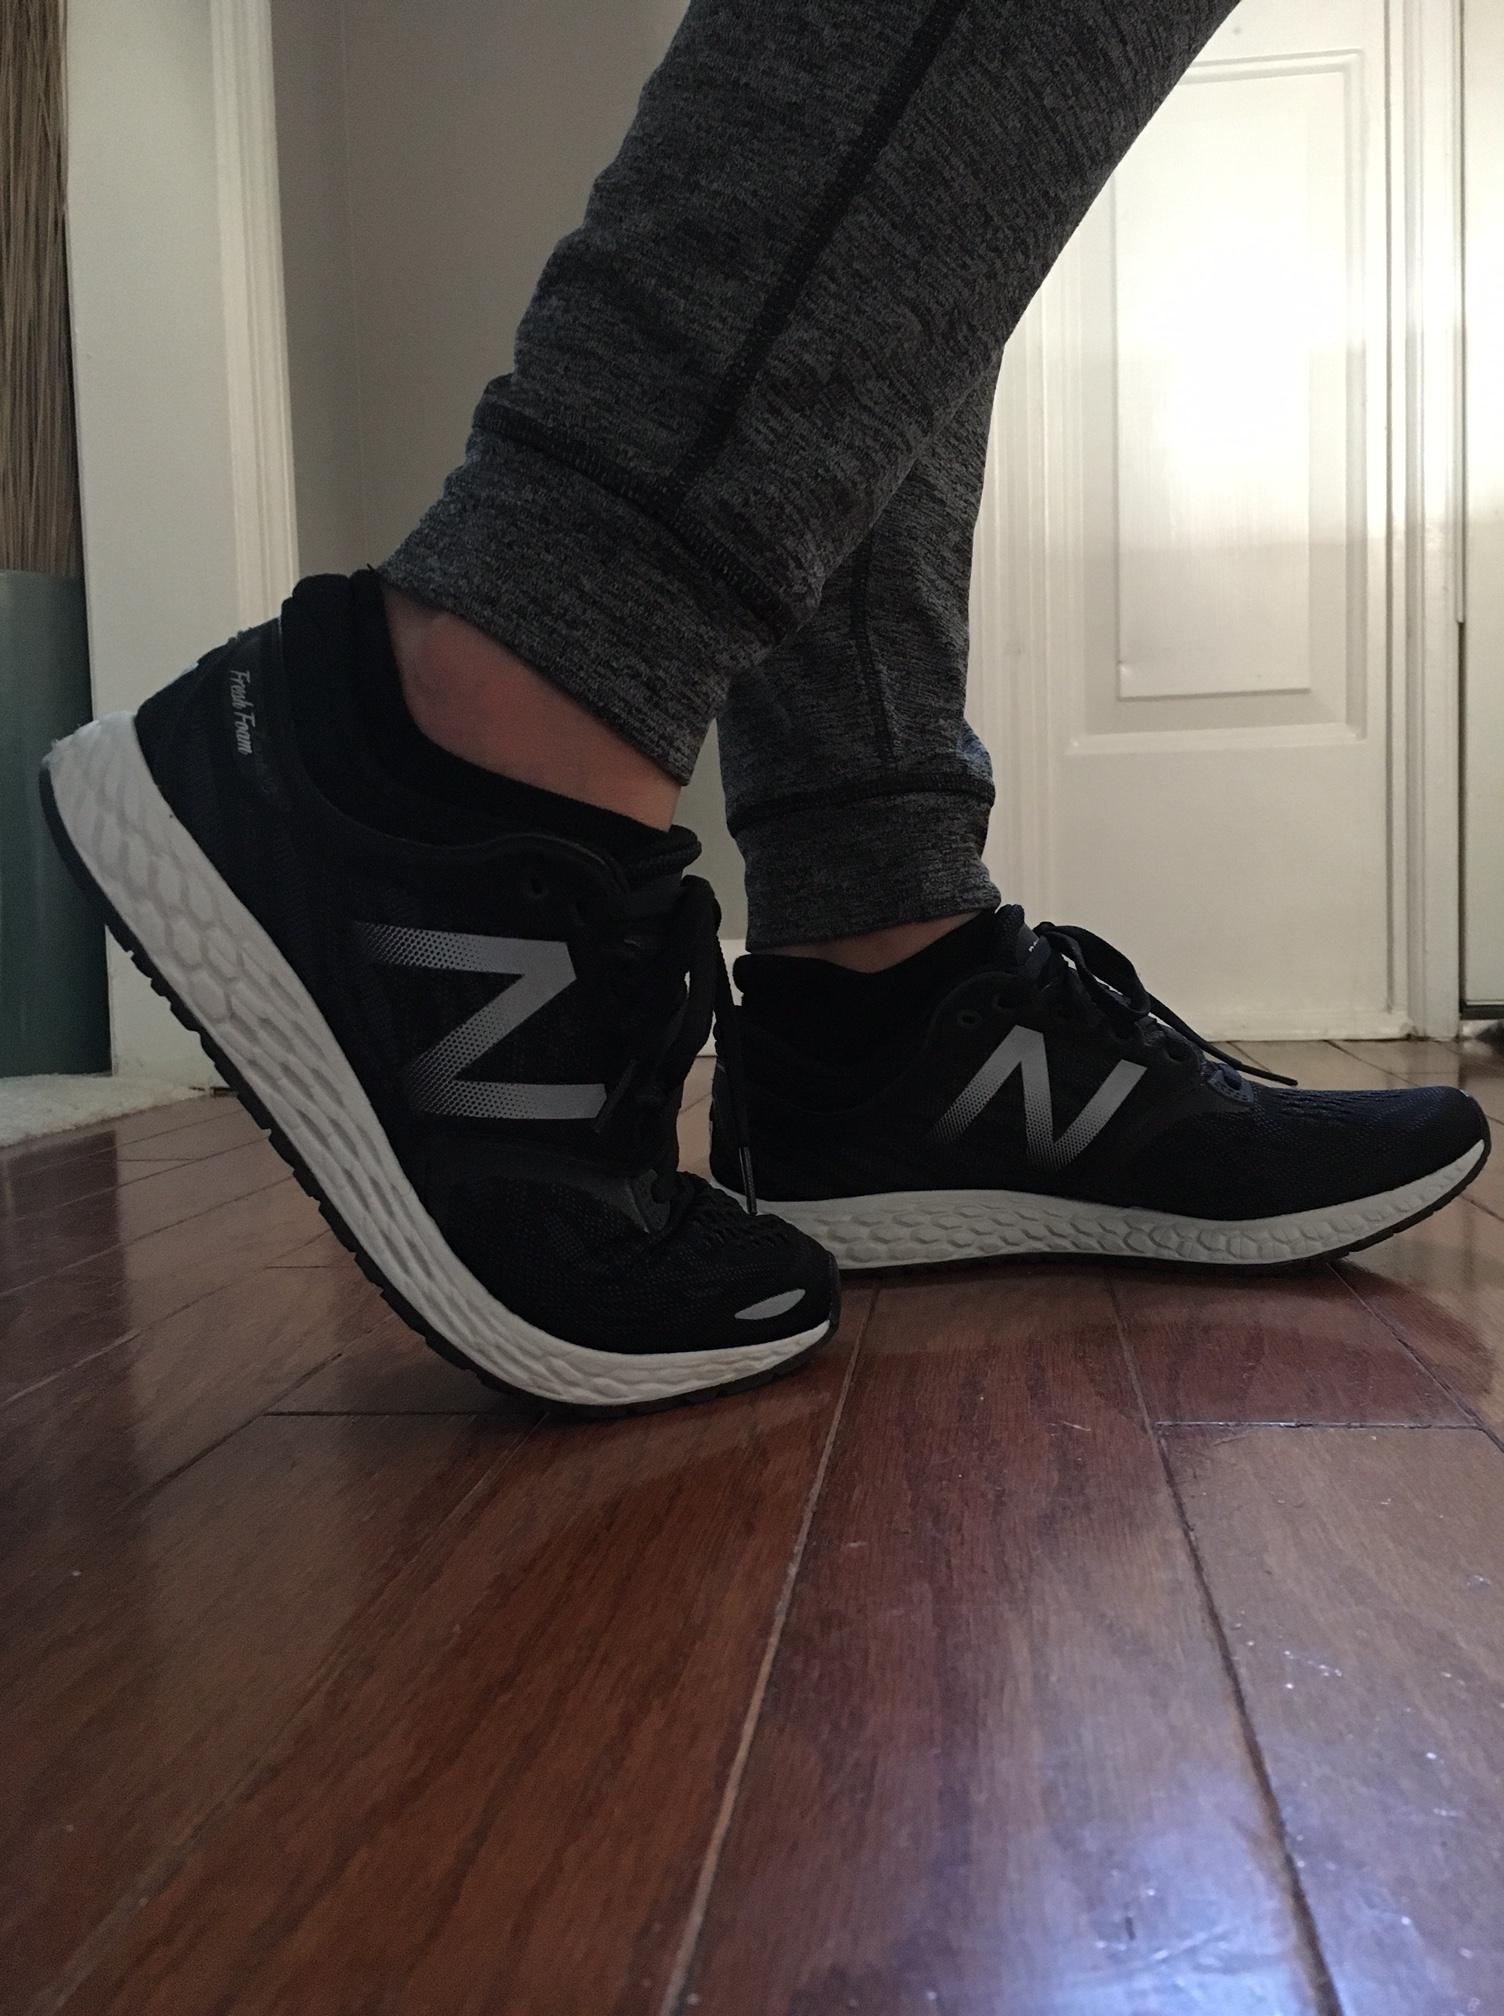 new balance zante v3 nyc